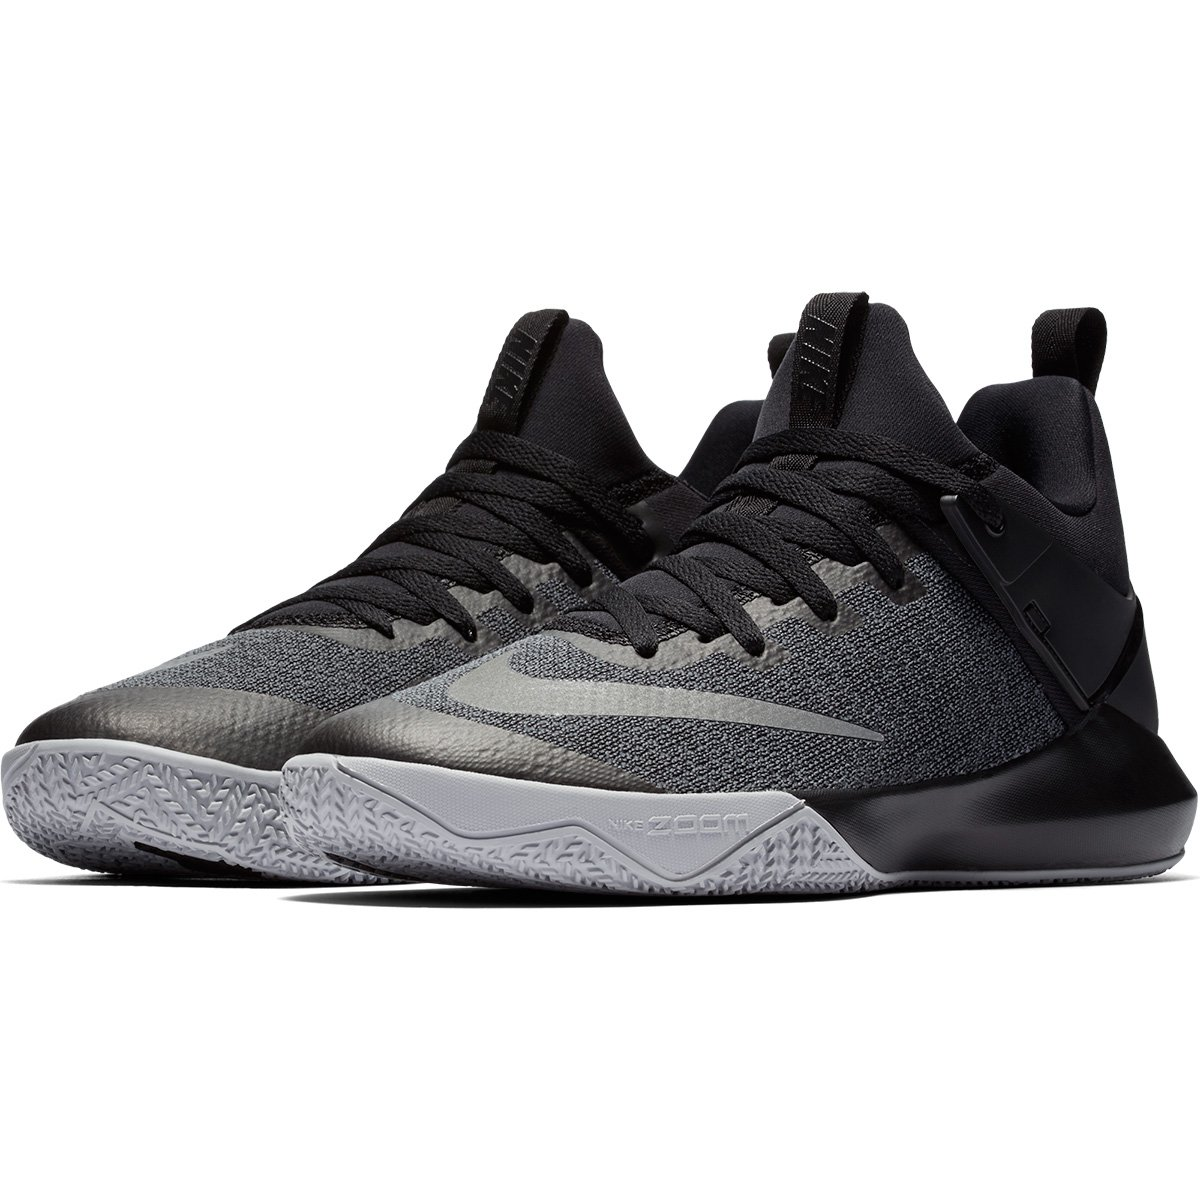 a9af1725ed Tênis Nike Zoom Shift Masculino - Preto e Cinza - Compre Agora ...